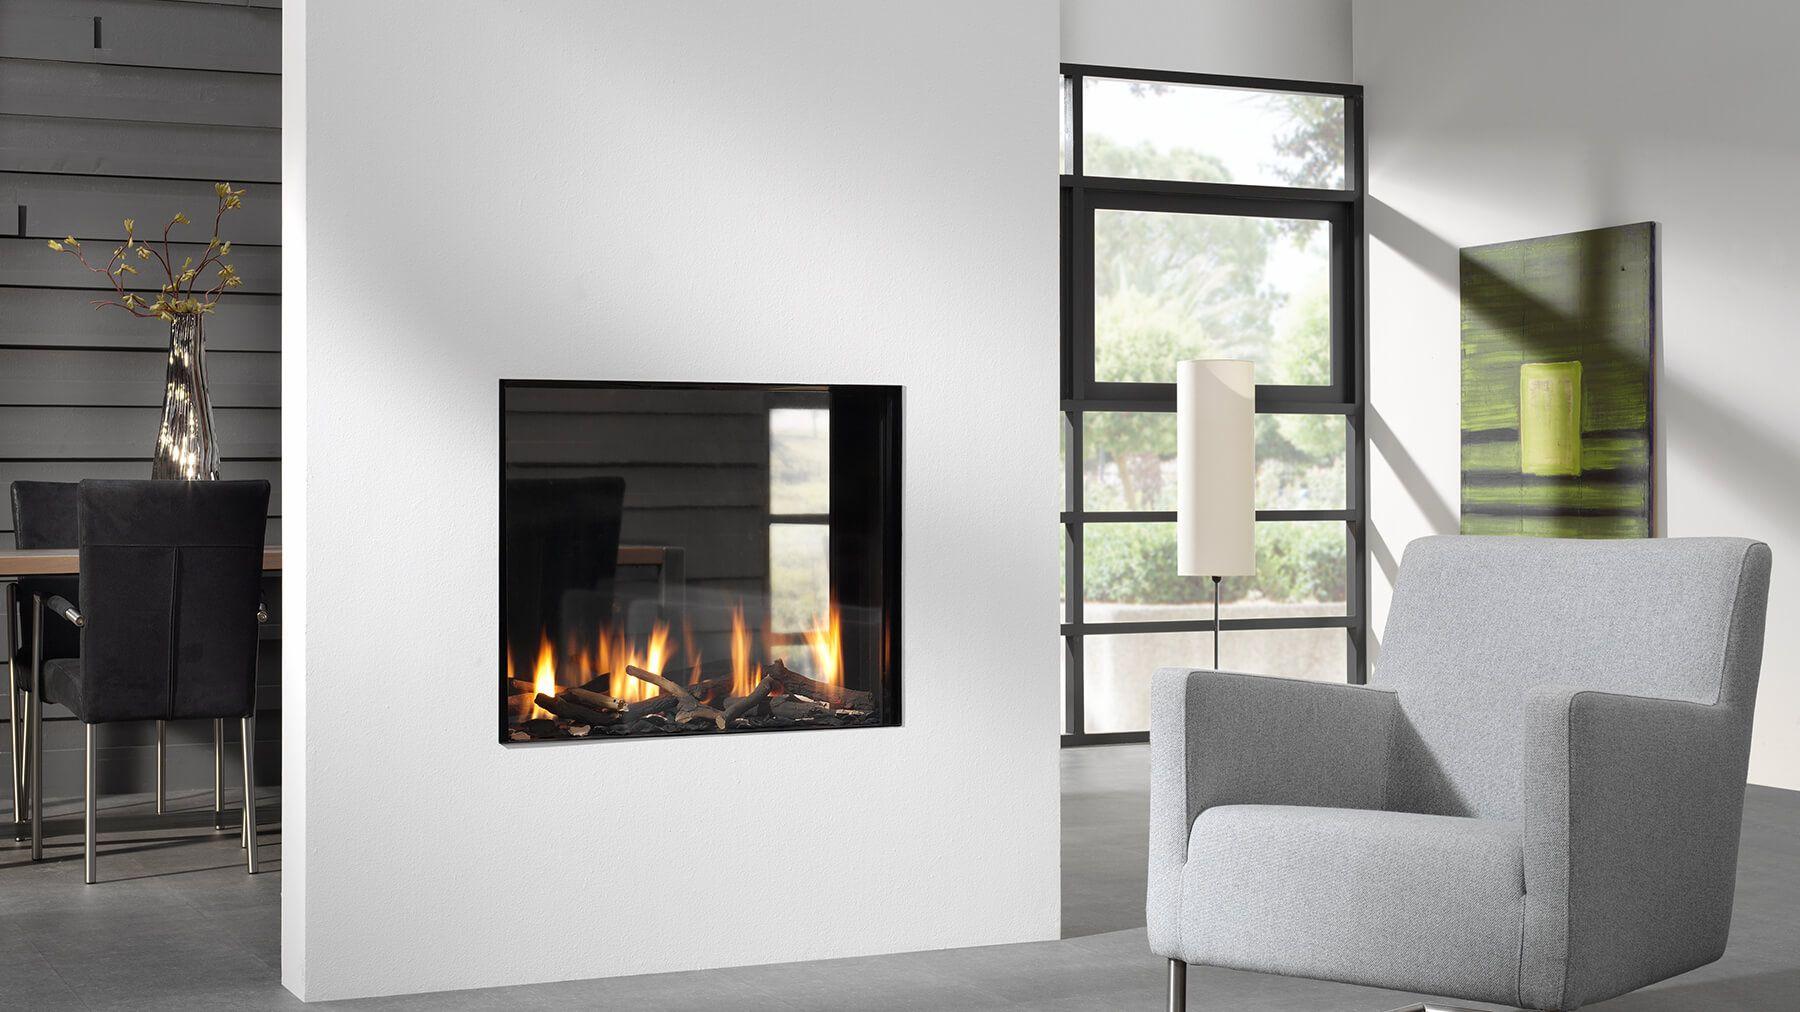 BioVision+Balanced+Flue+Gas+Fire Gas fireplace, Double